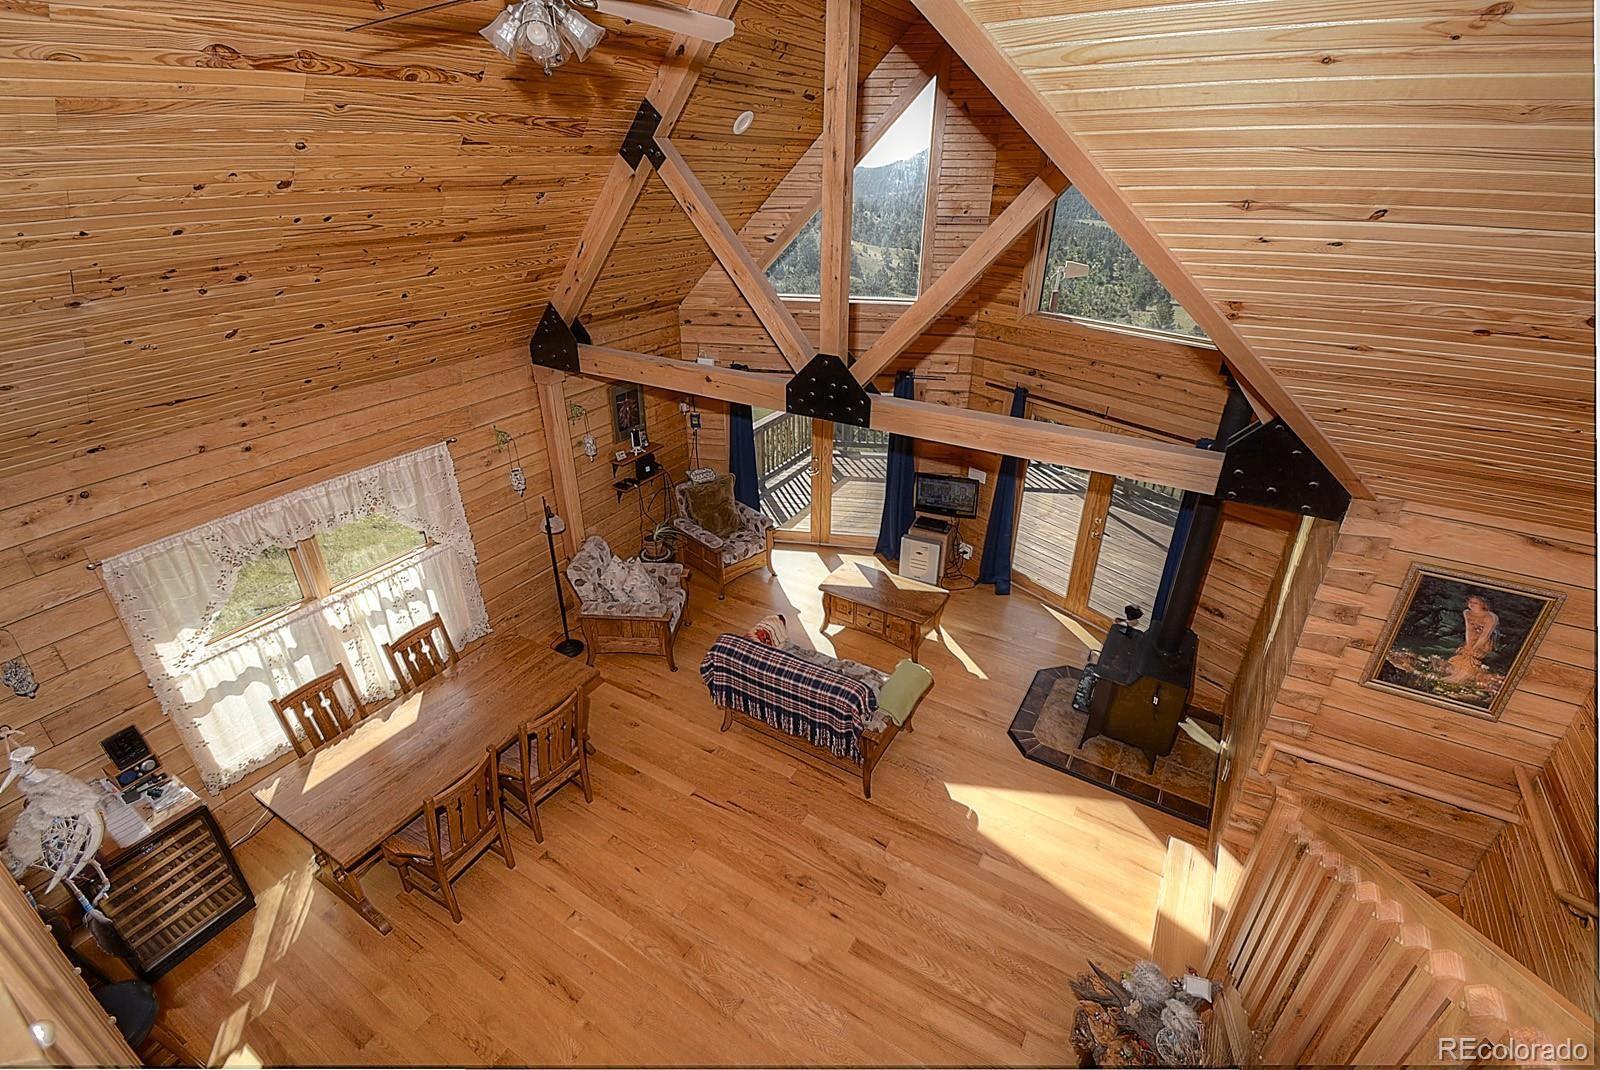 MLS# 8182693 - 25 - 396 Eagle Nest Trail, Guffey, CO 80820